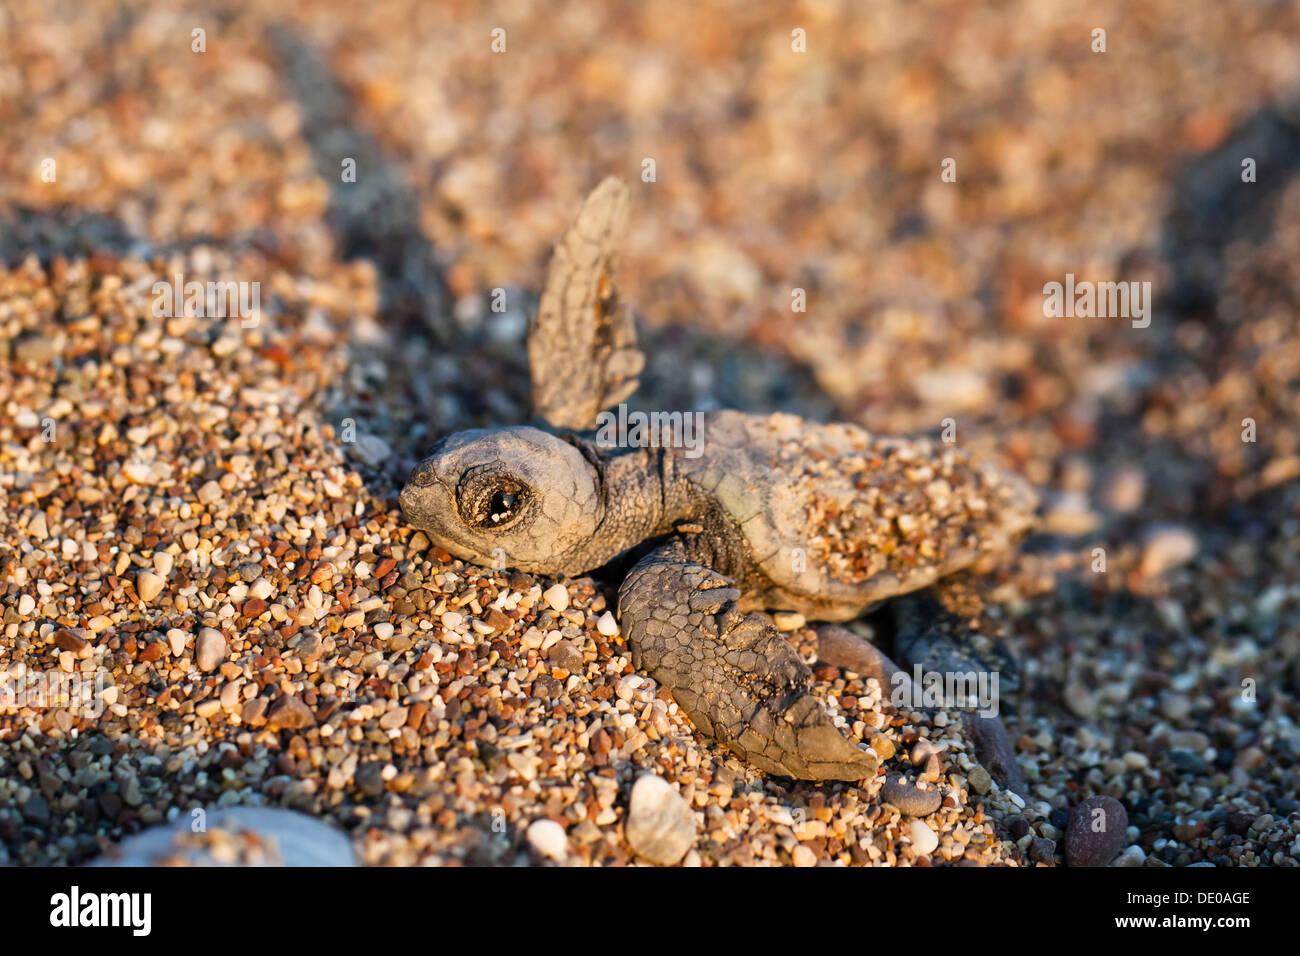 Loggerhead Sea Turtle (Caretta caretta), hatchling, Lycian Coast, Turkey, Asia Minor - Stock Image